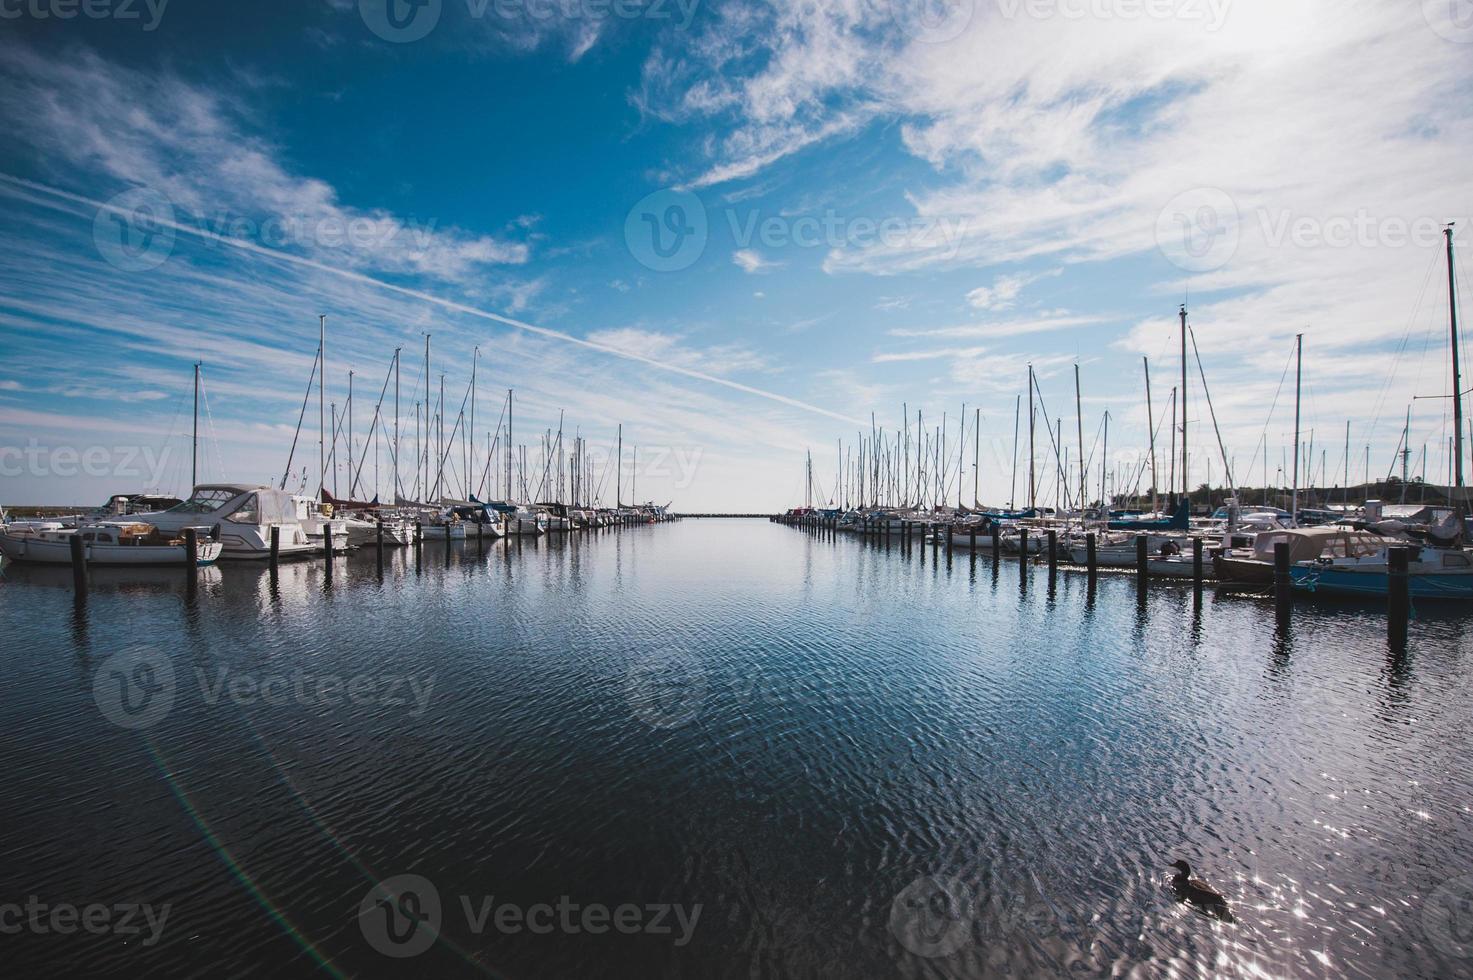 inúmeros iates no porto de copenhaga dinamarca foto